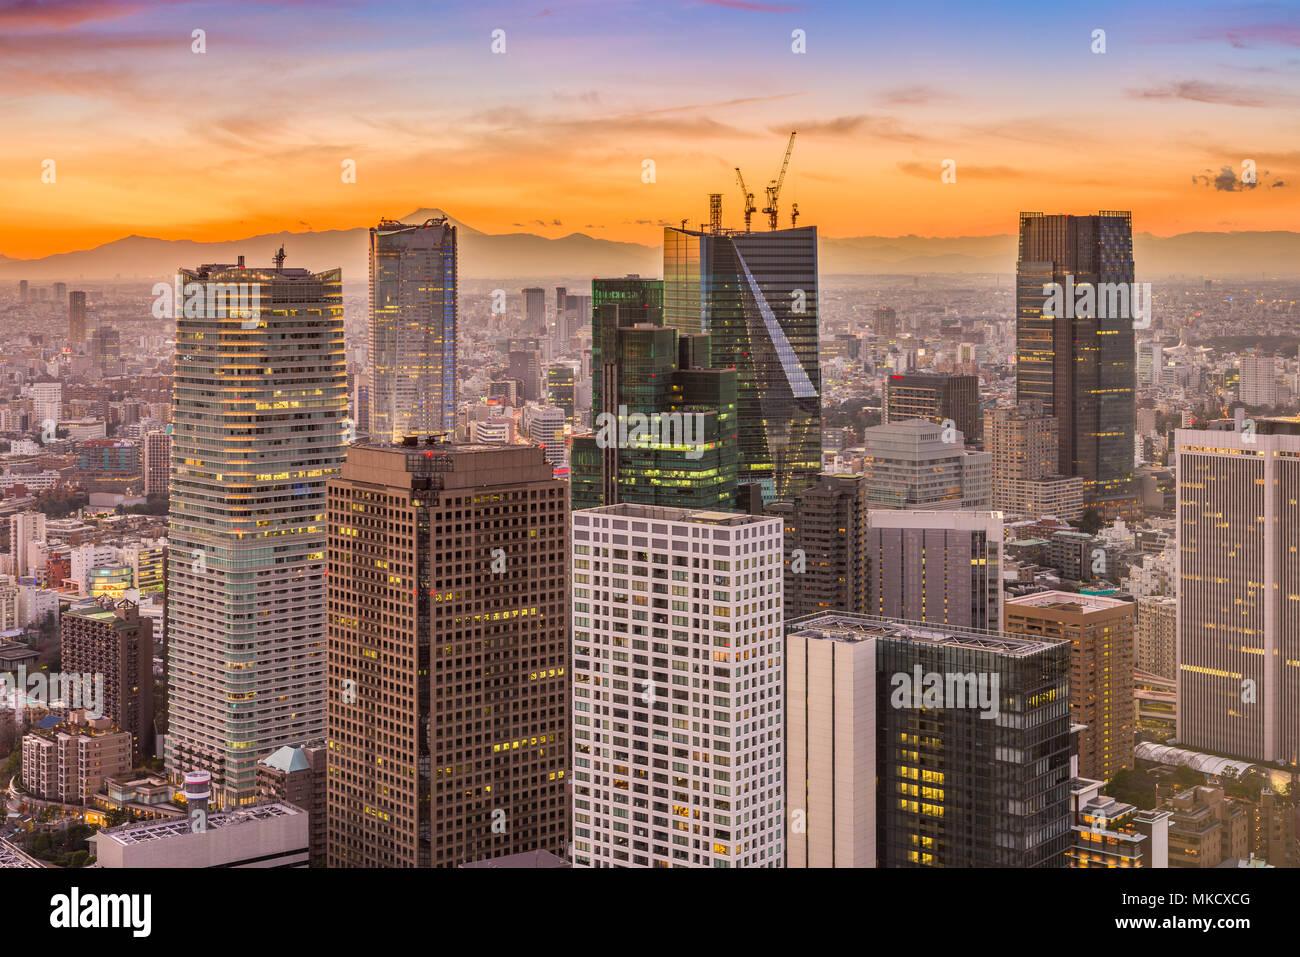 Tokyo, Japan financial buildings cityscape at dusk. - Stock Image